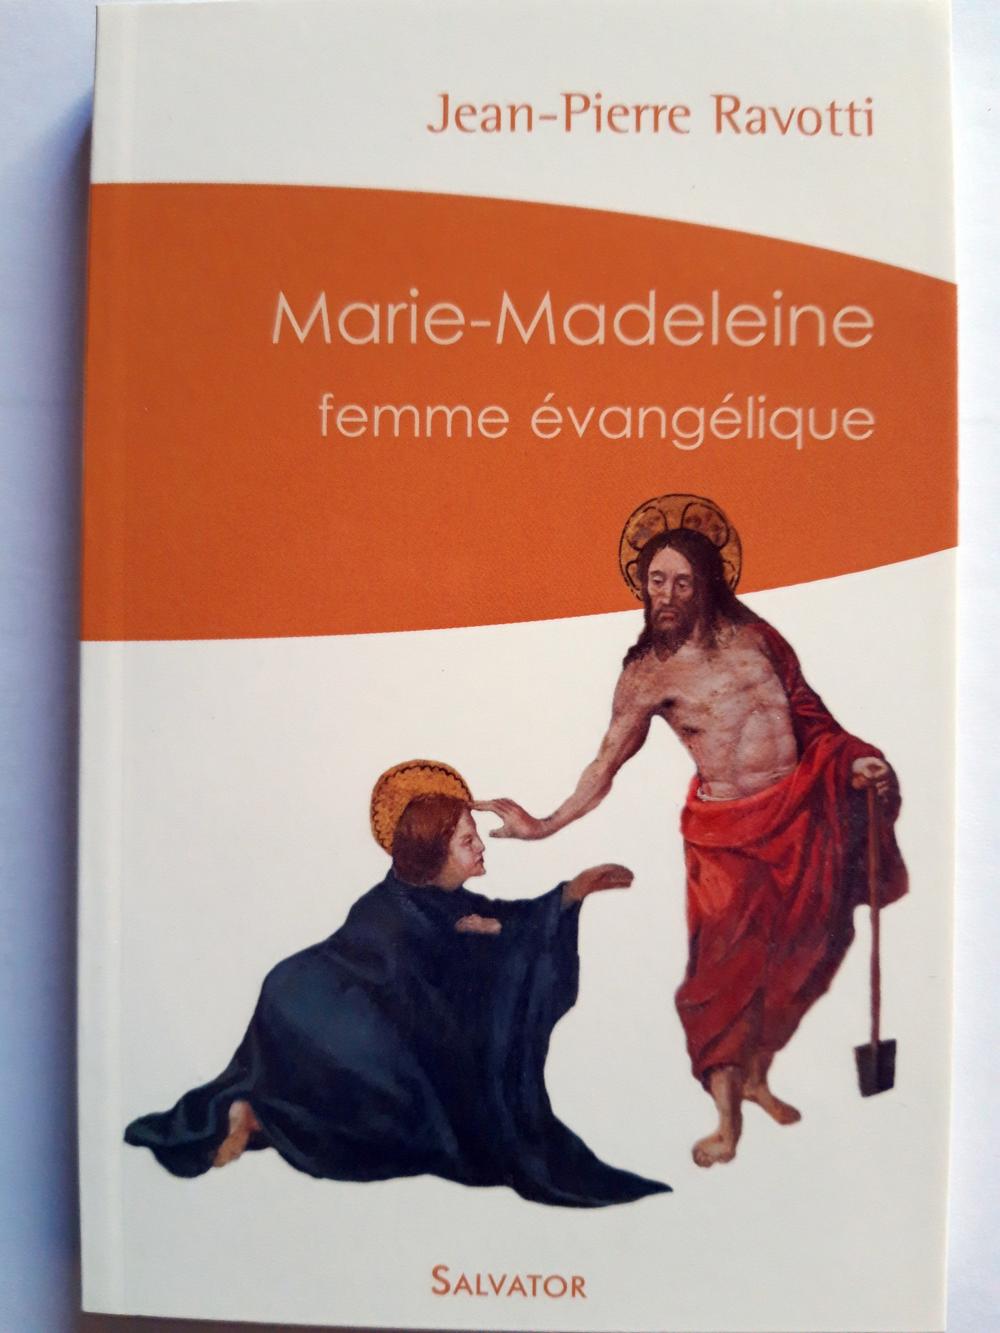 Marie-Madeleine femme évangélique